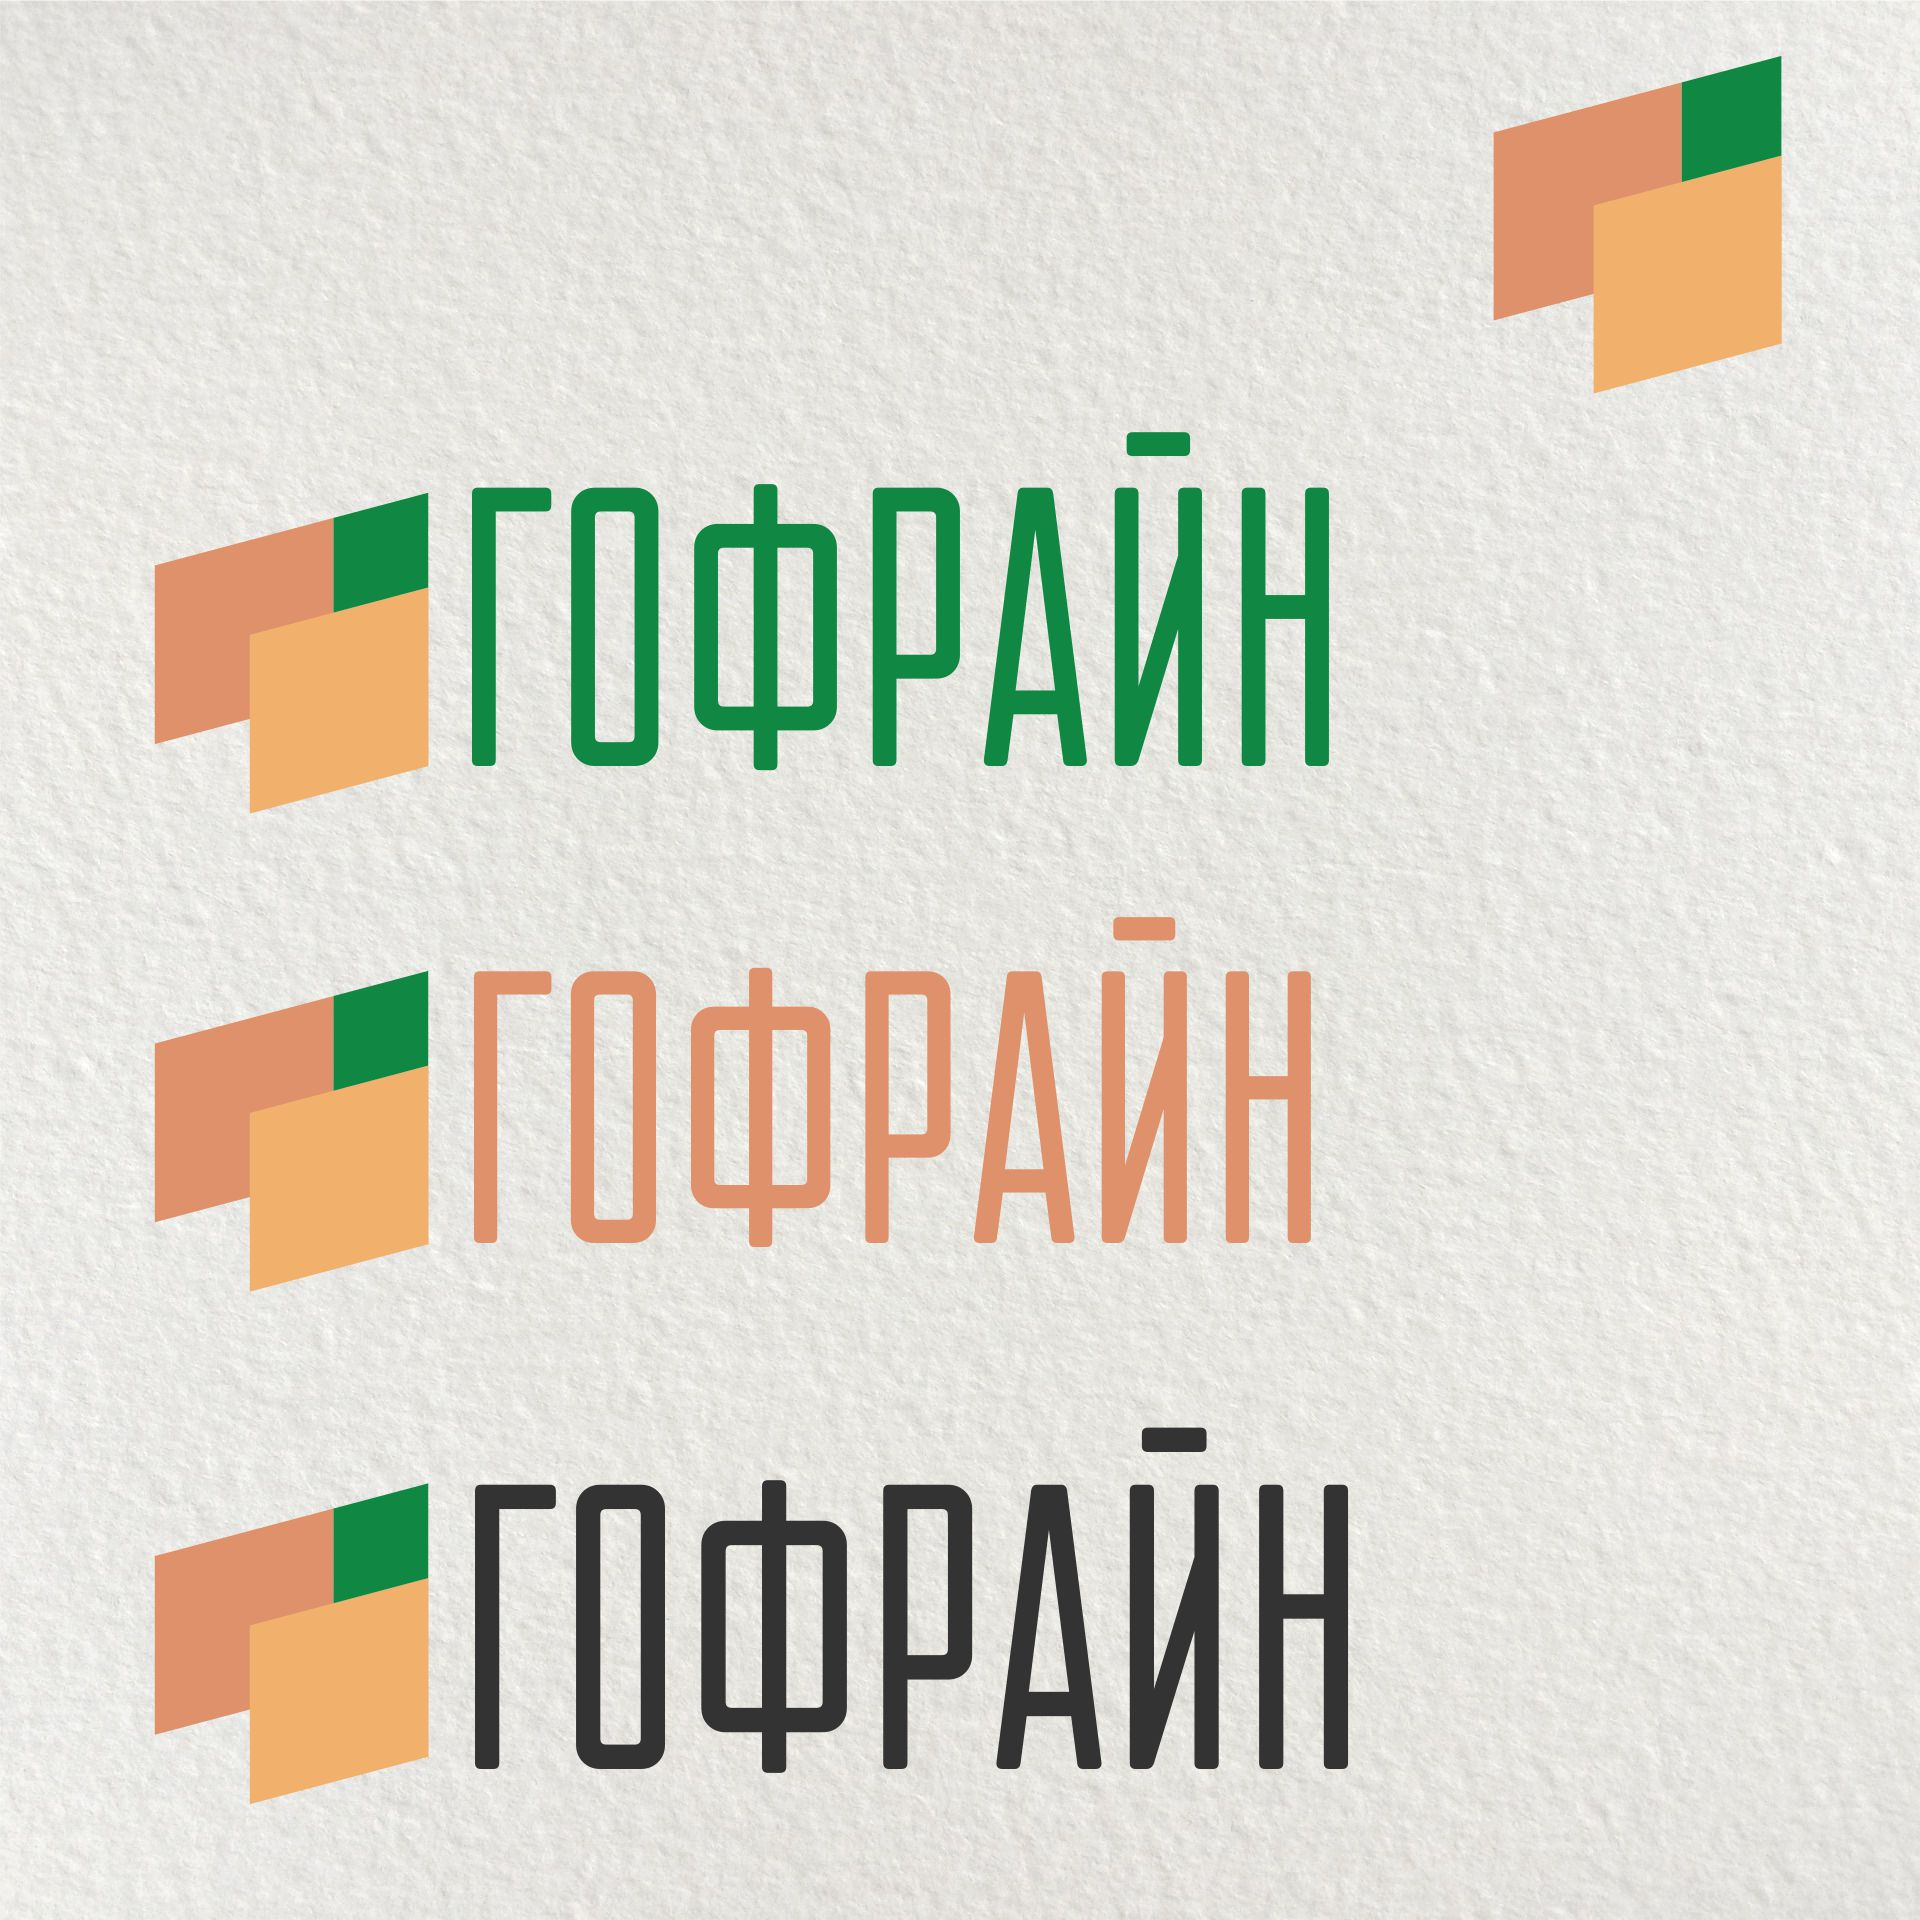 Логотип для компании по реализации упаковки из гофрокартона фото f_3825cdafcefd06d6.jpg